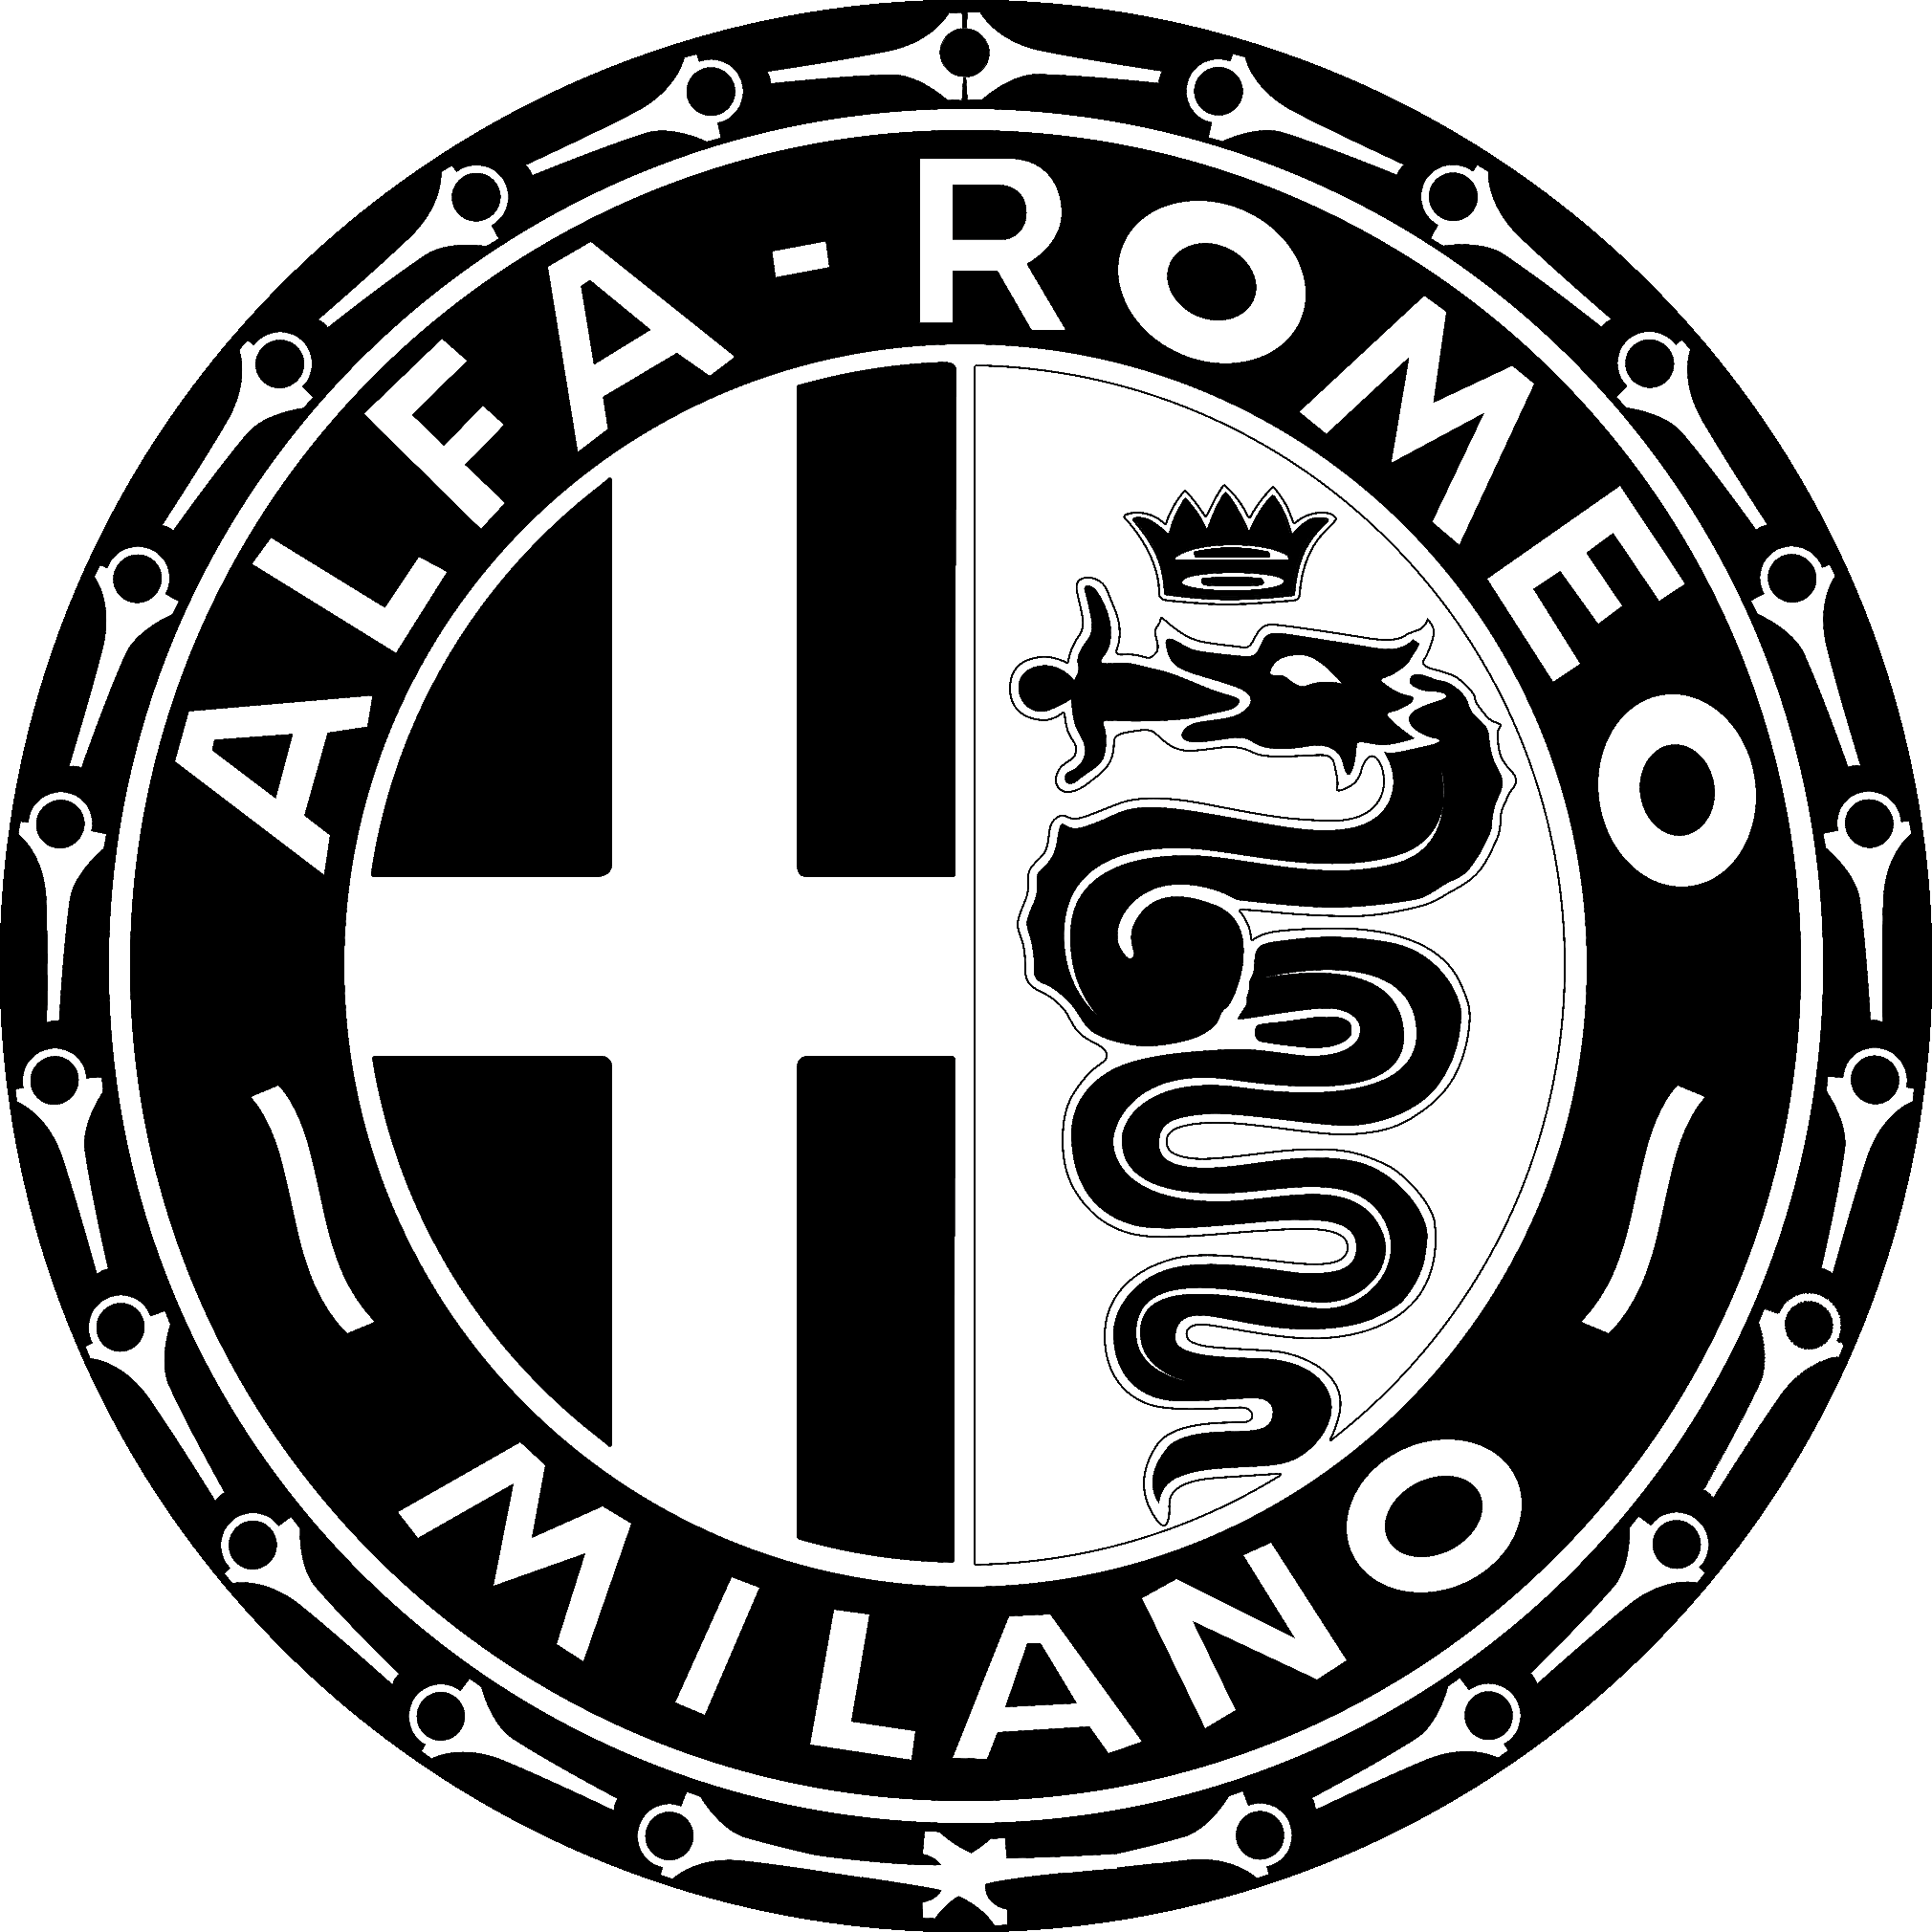 Альфа ромео логотип картинки